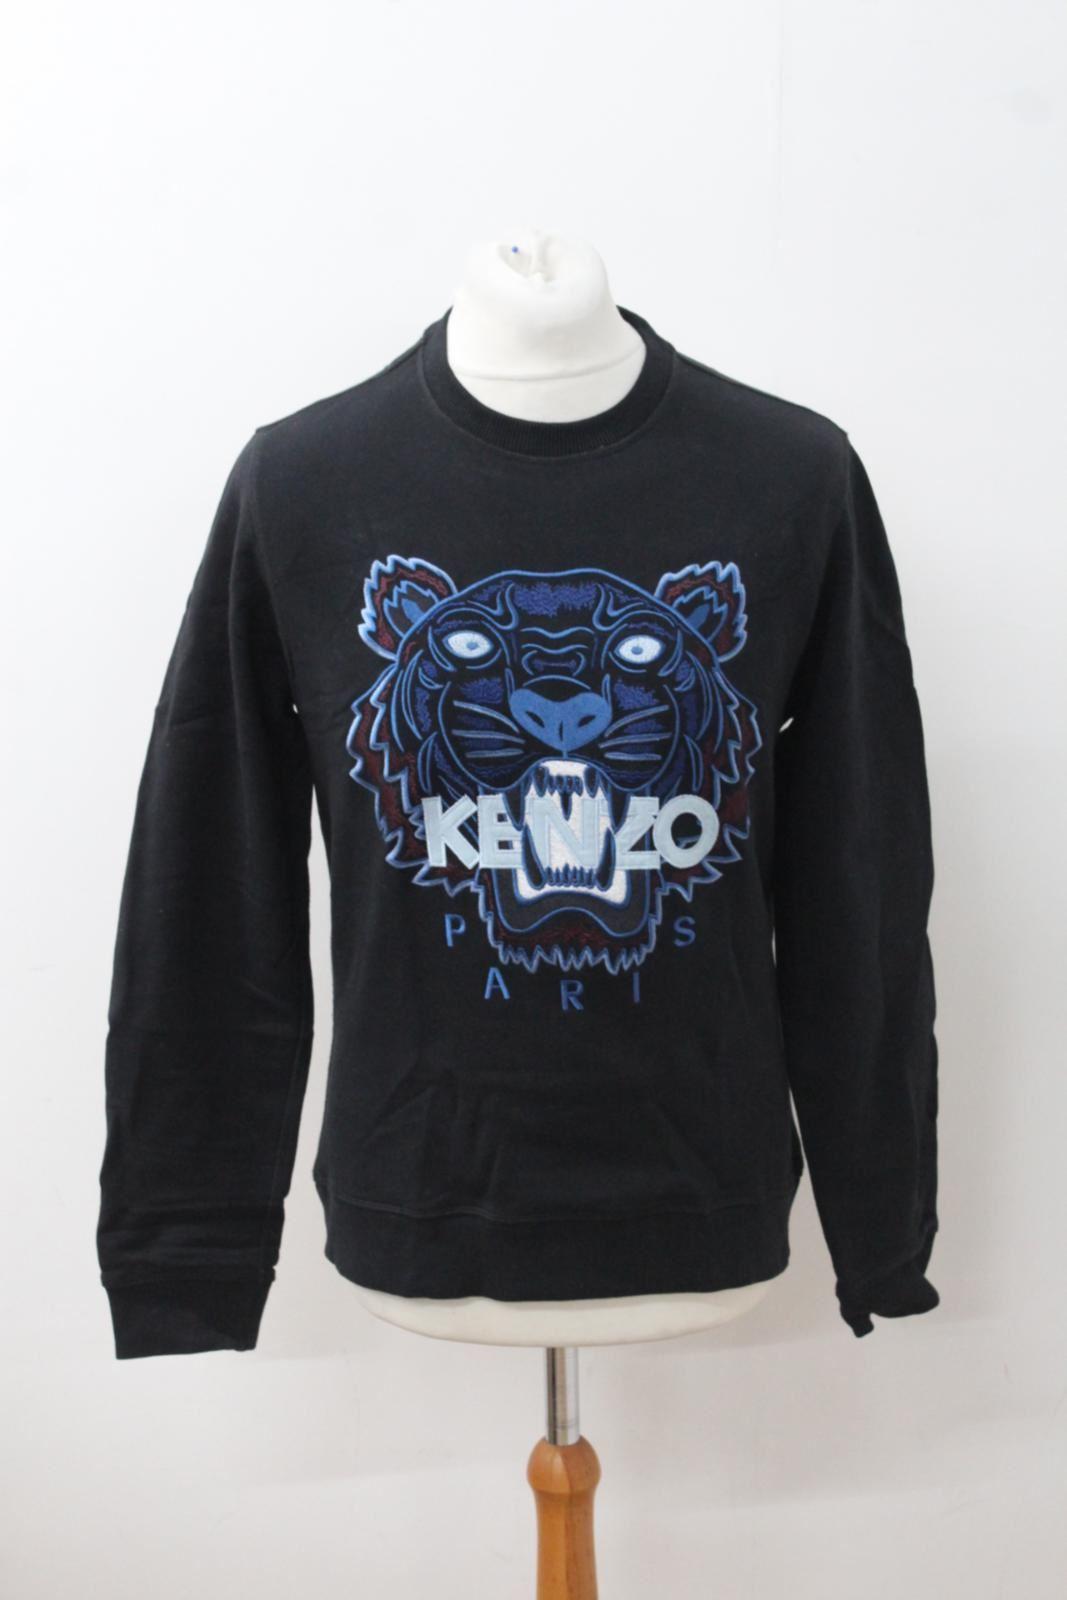 751bf57c KENZO Men's Black & Blue Tiger Head Logo Crew Neck Jumper Sweatshirt Size M